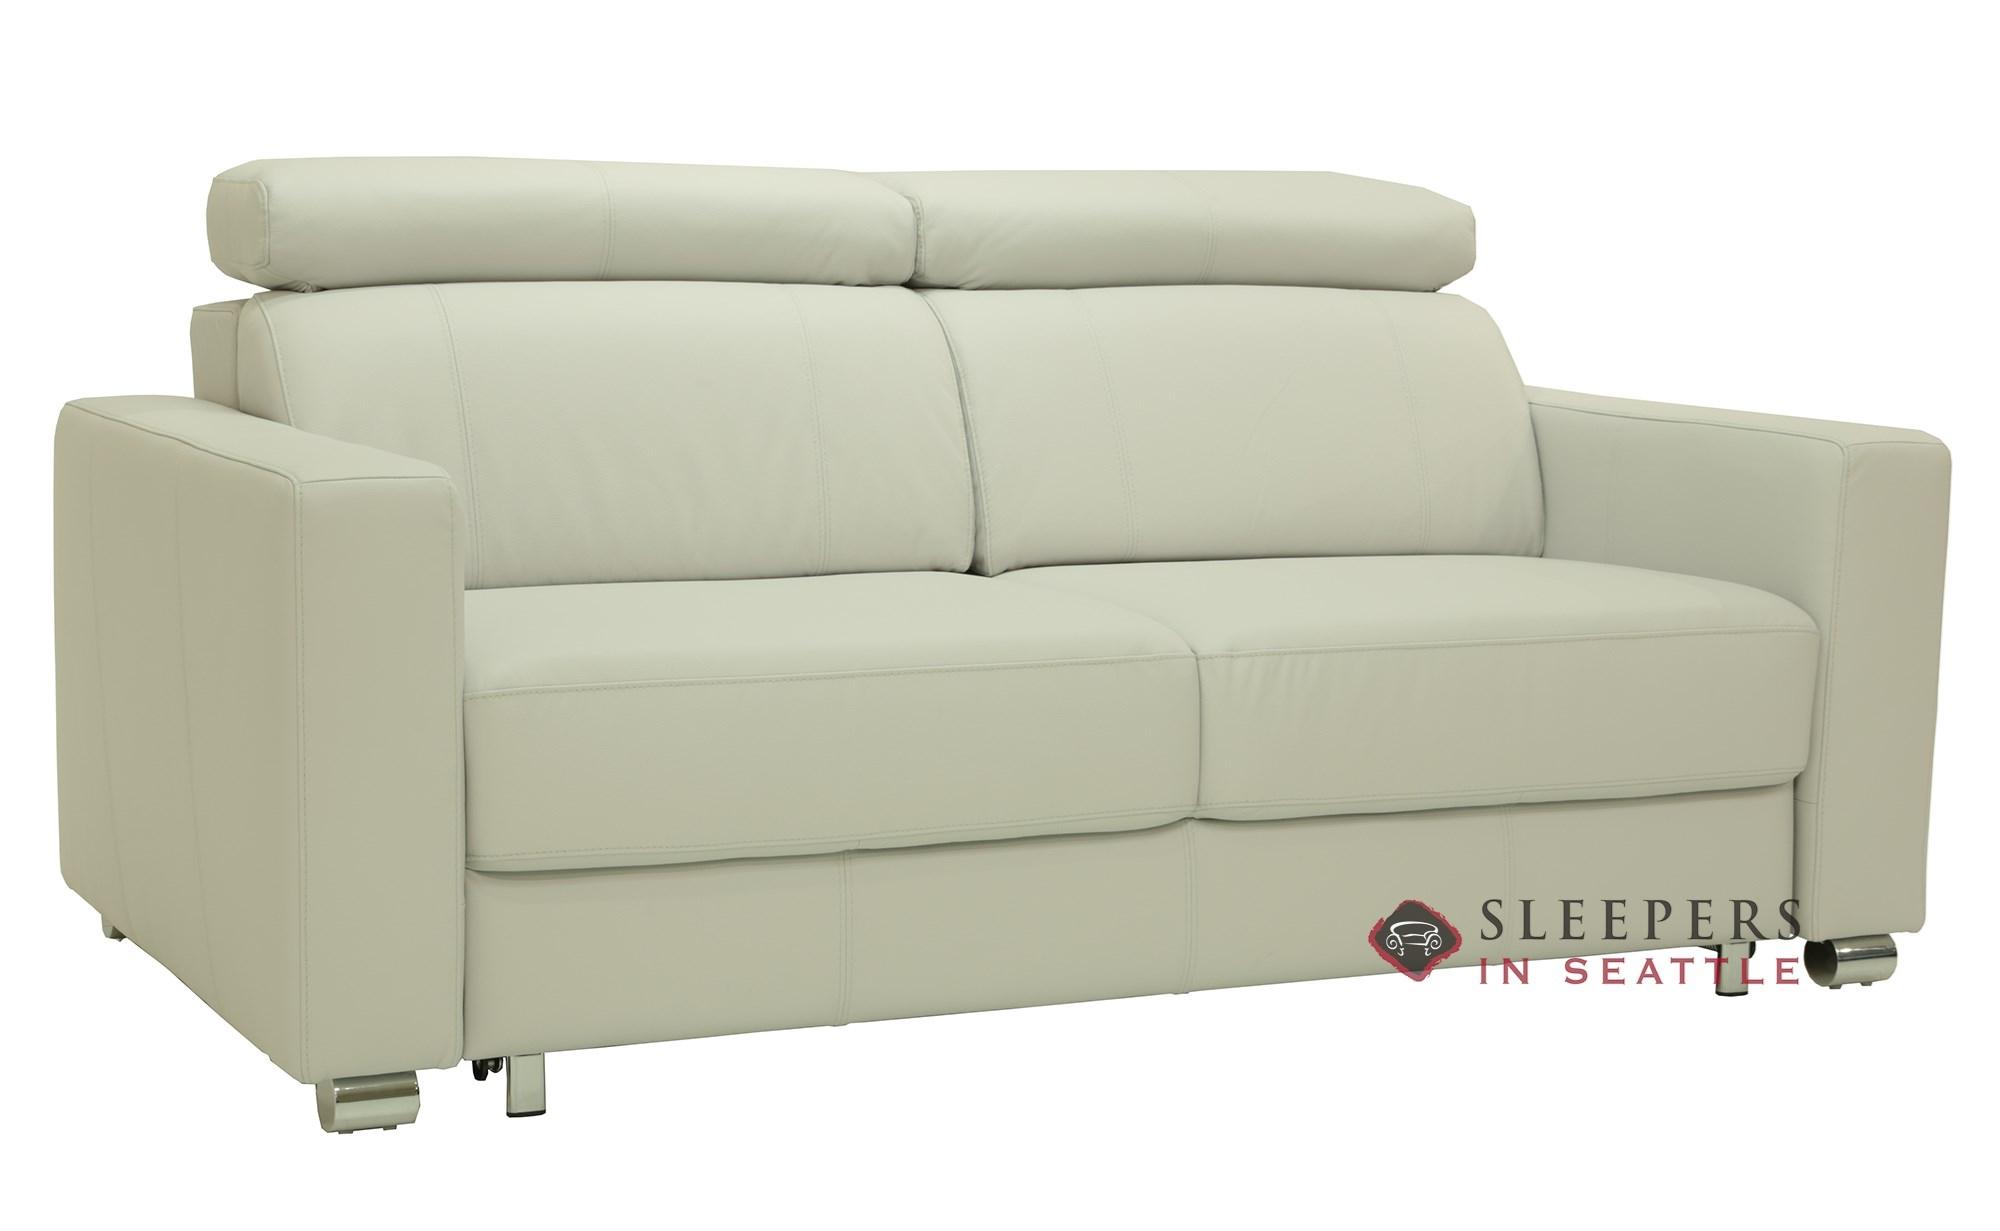 Luonto West Queen Leather Sleeper Sofa